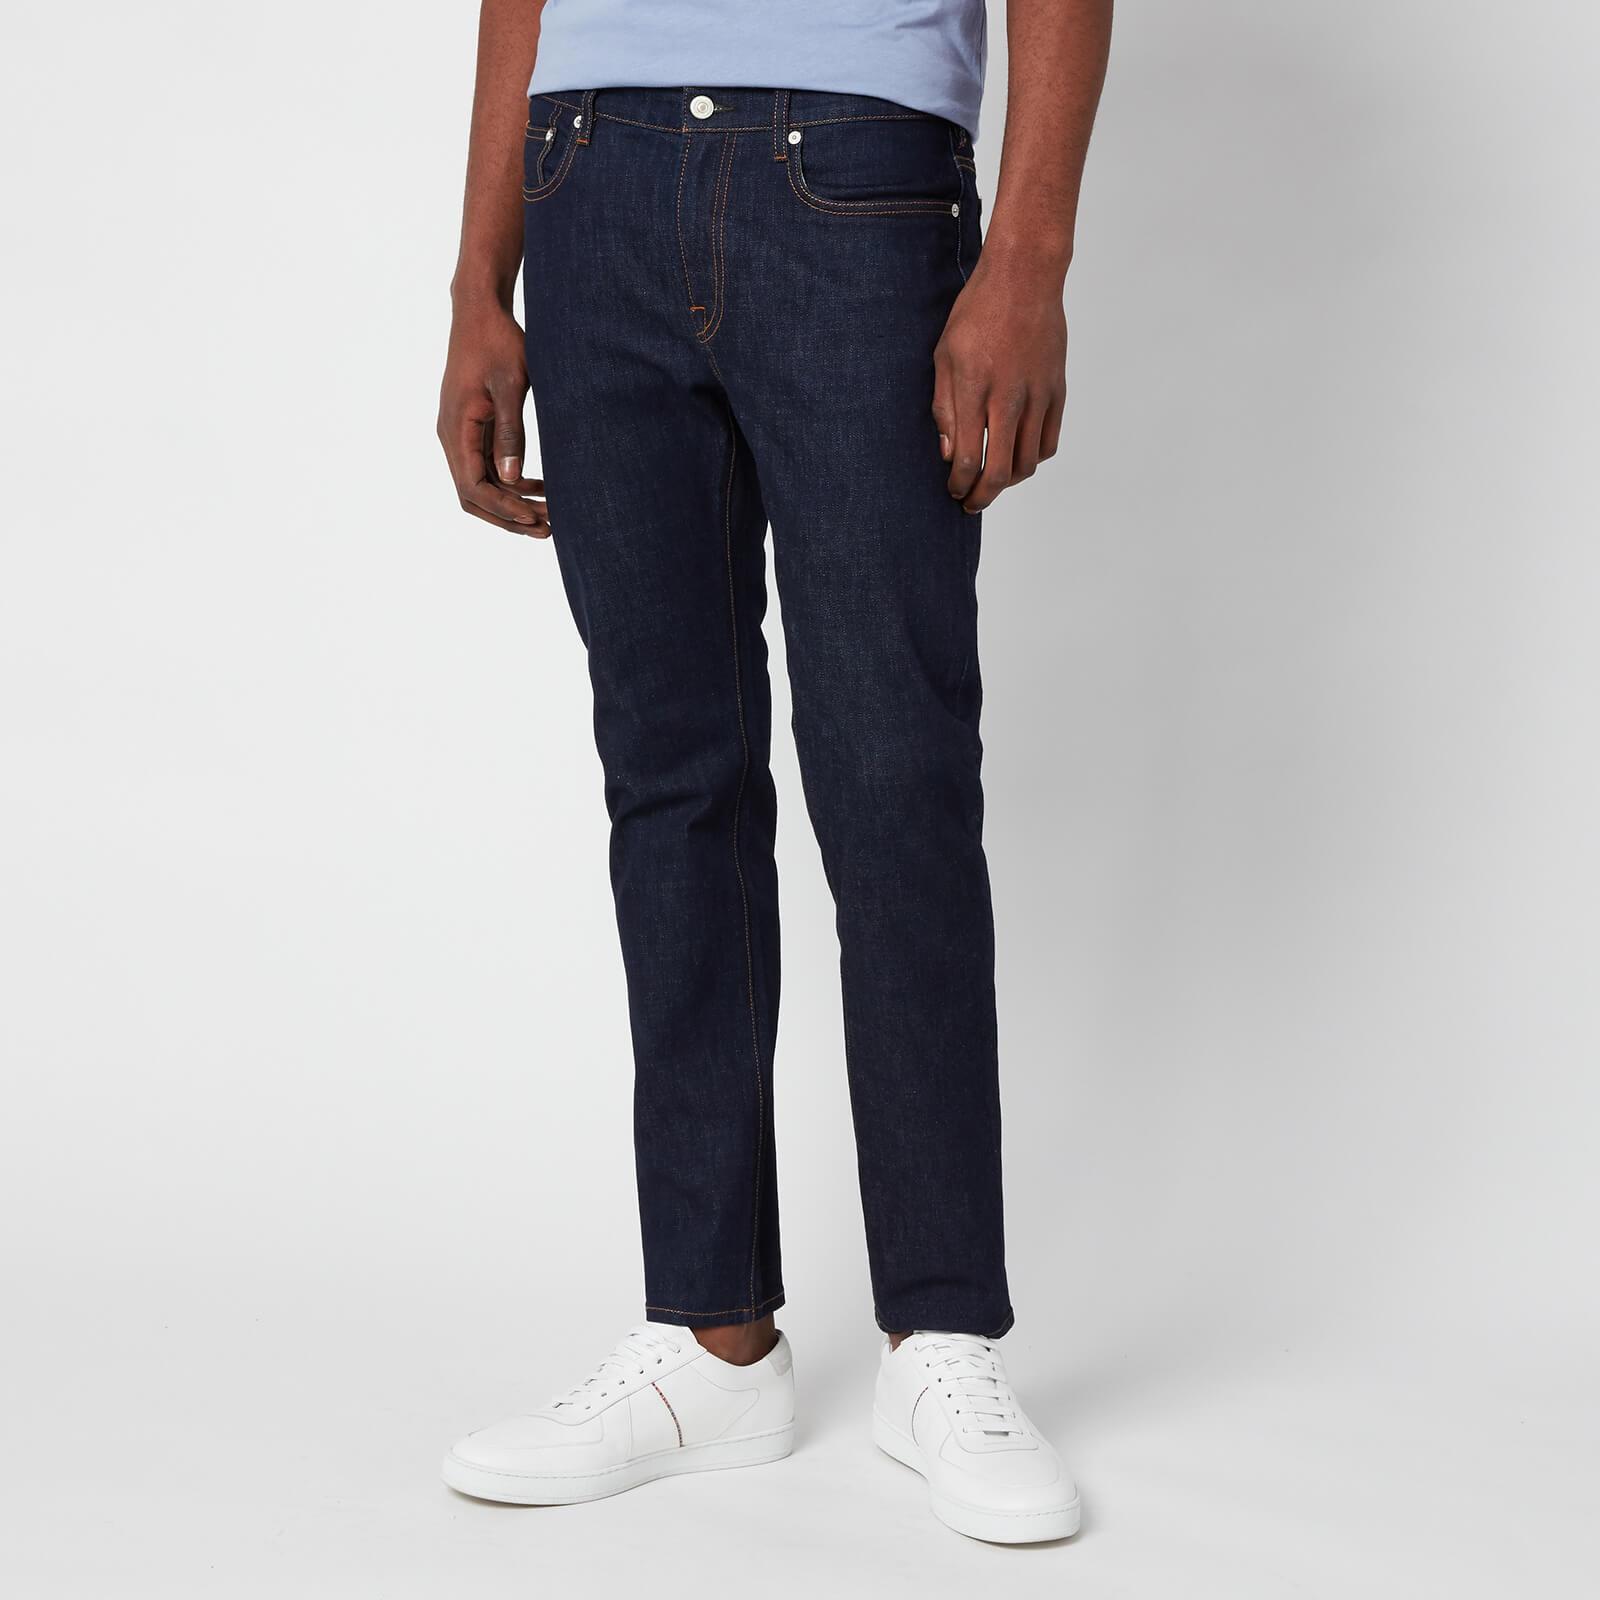 Ps Paul Smith Men's Slim Fit Short Jeans - Dark Blue - W34